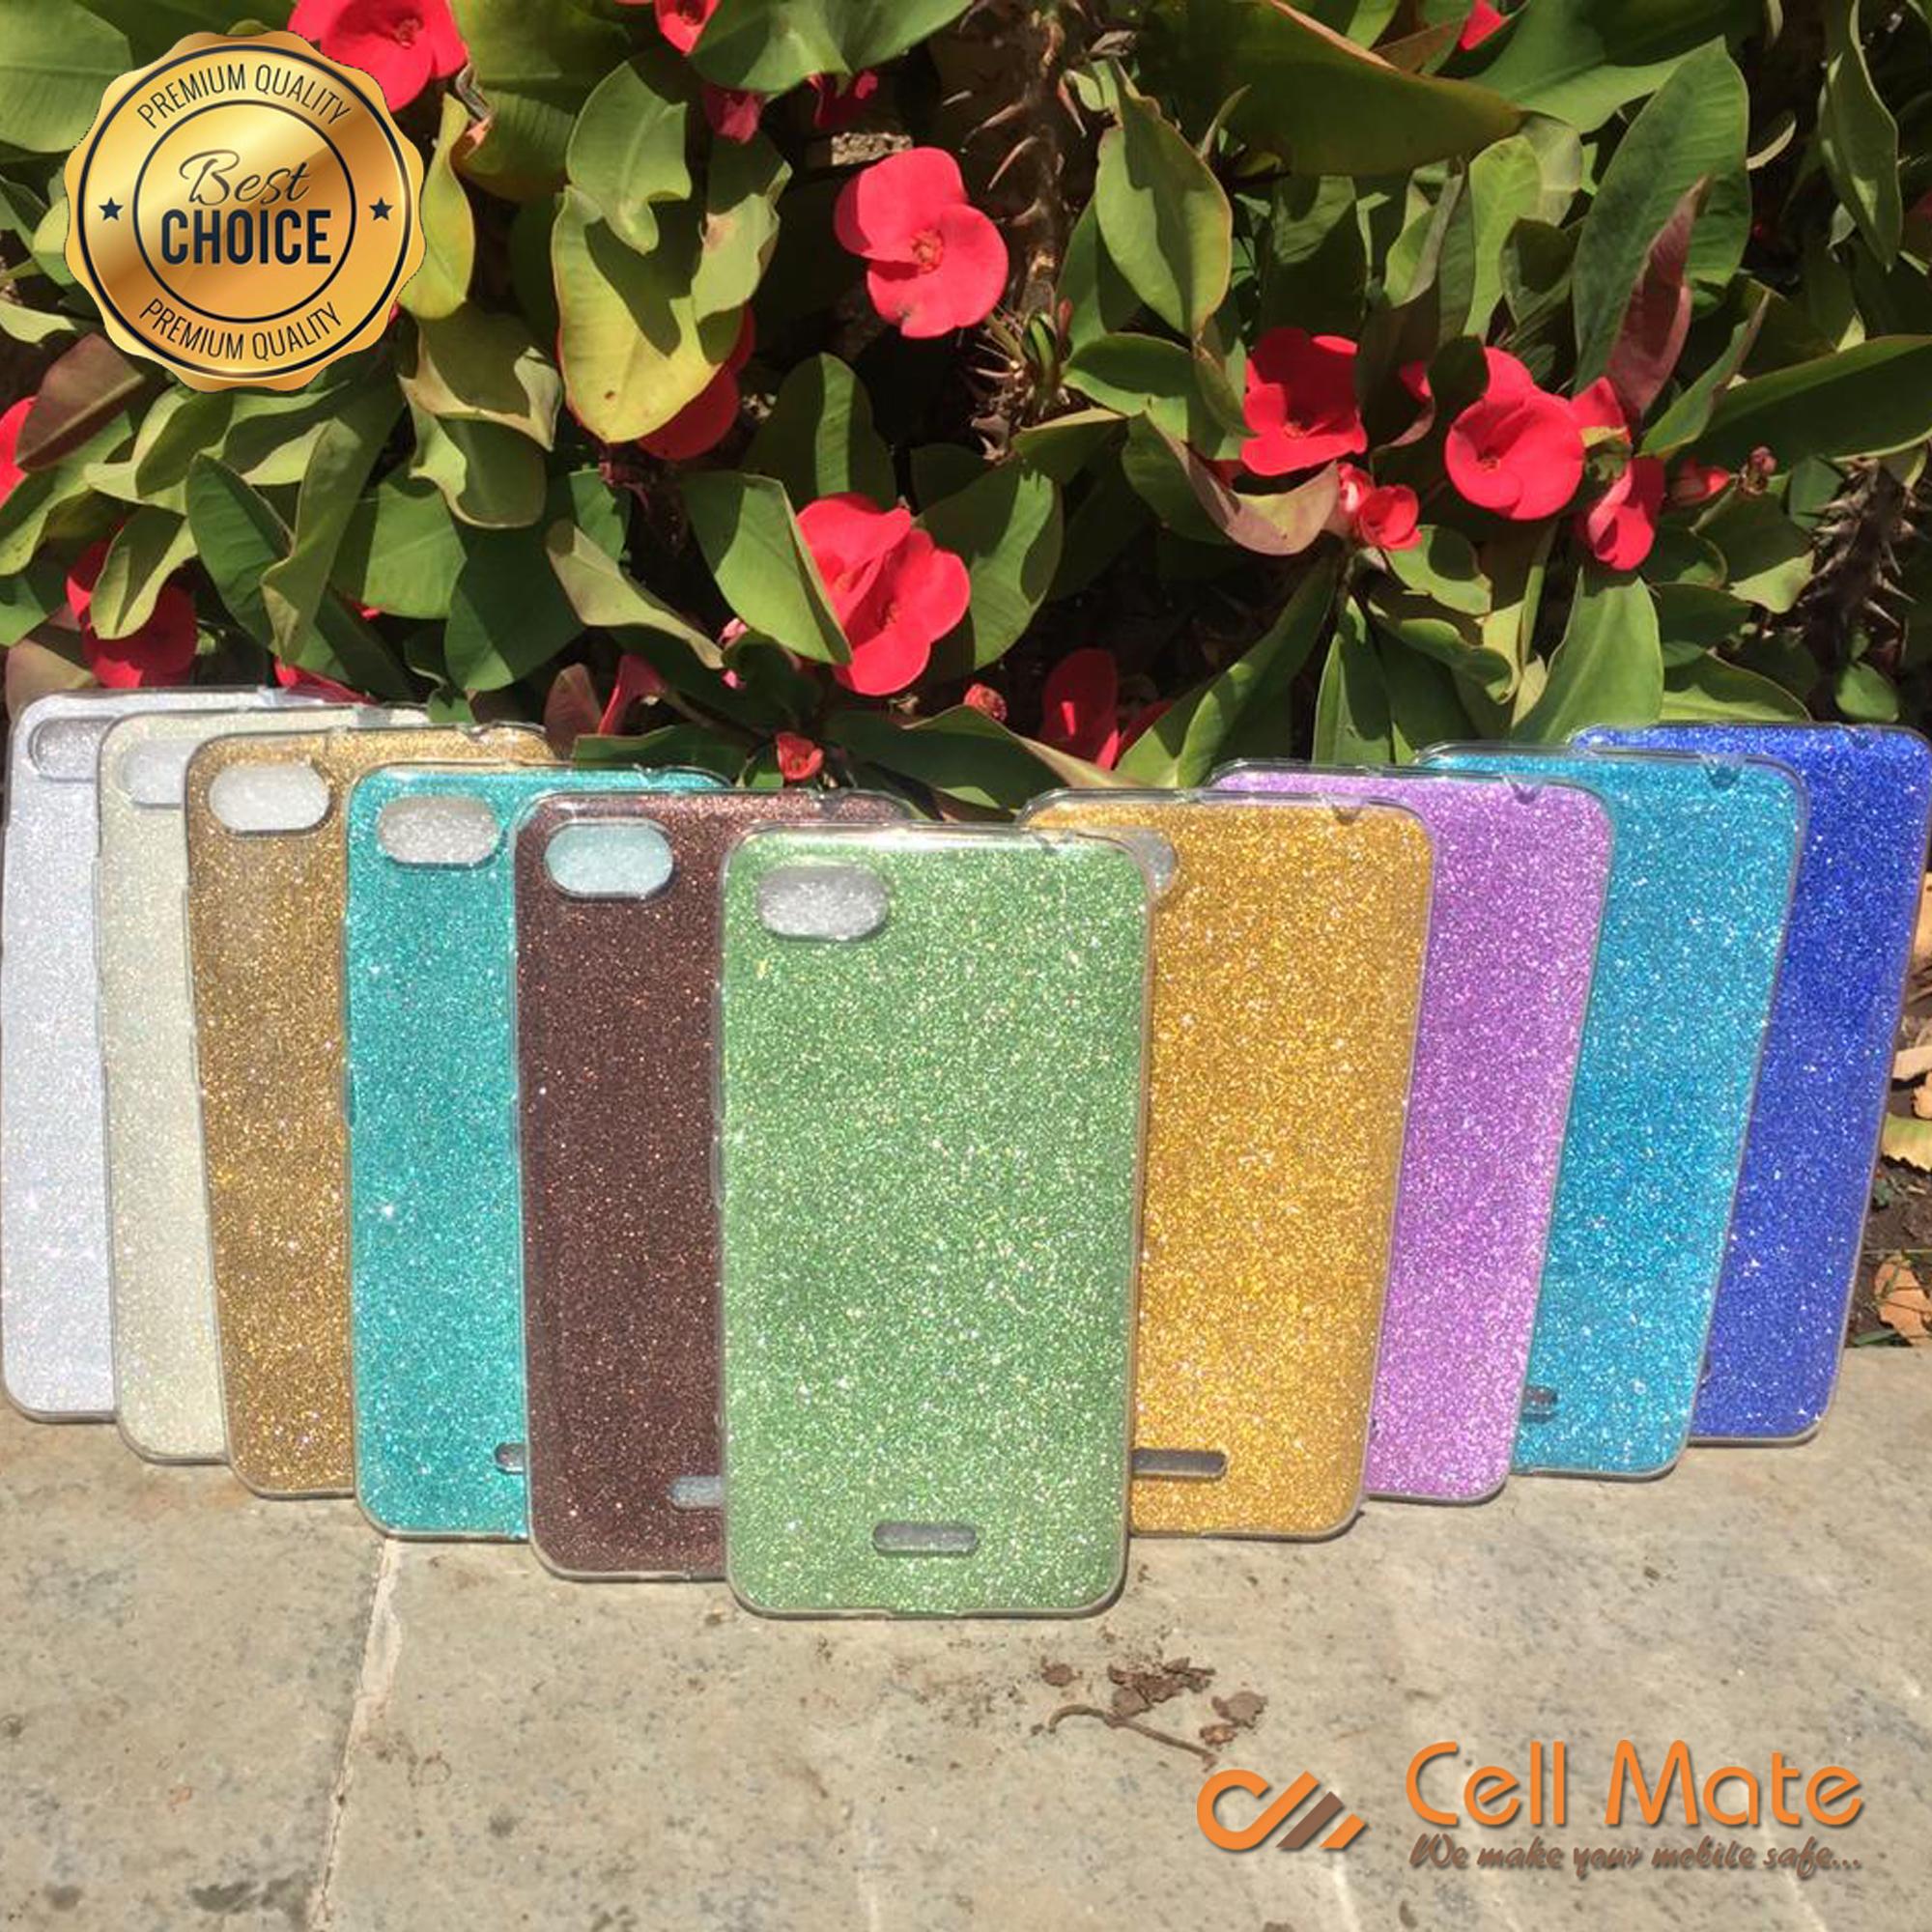 Blink Fancy Mobile Cases